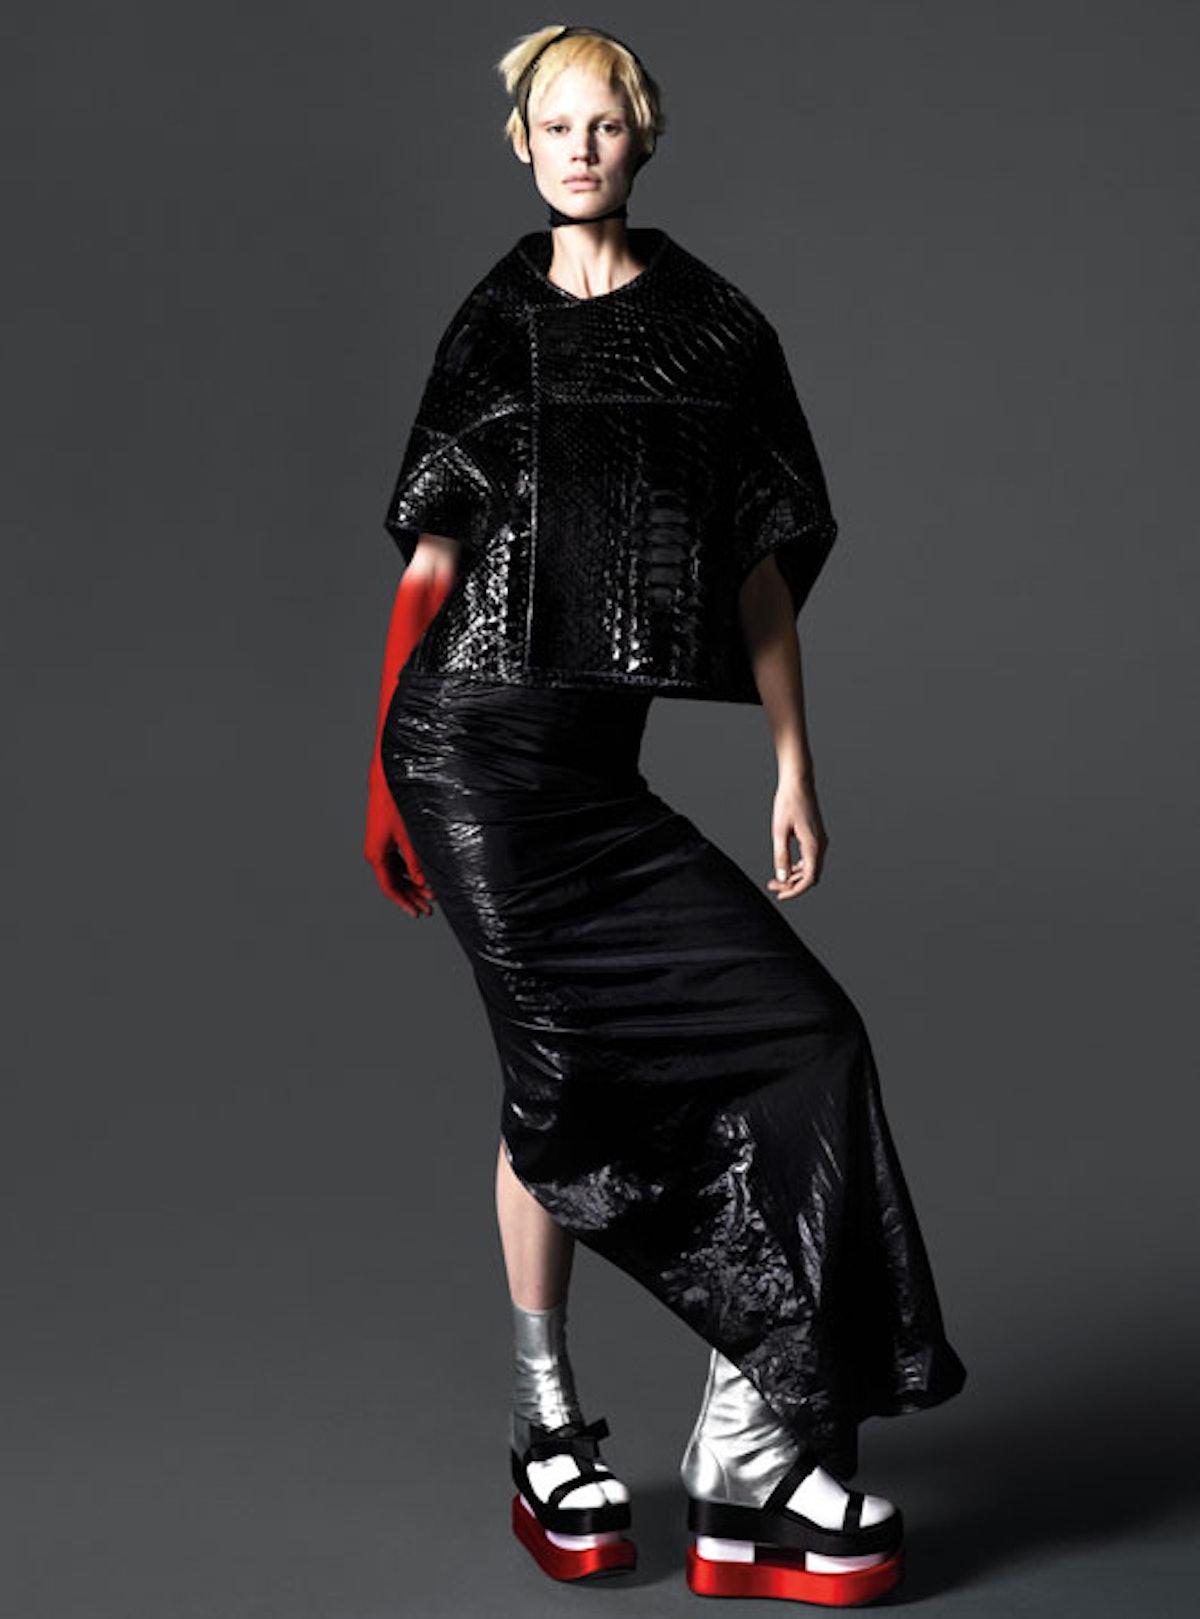 Leather fashion inspiration